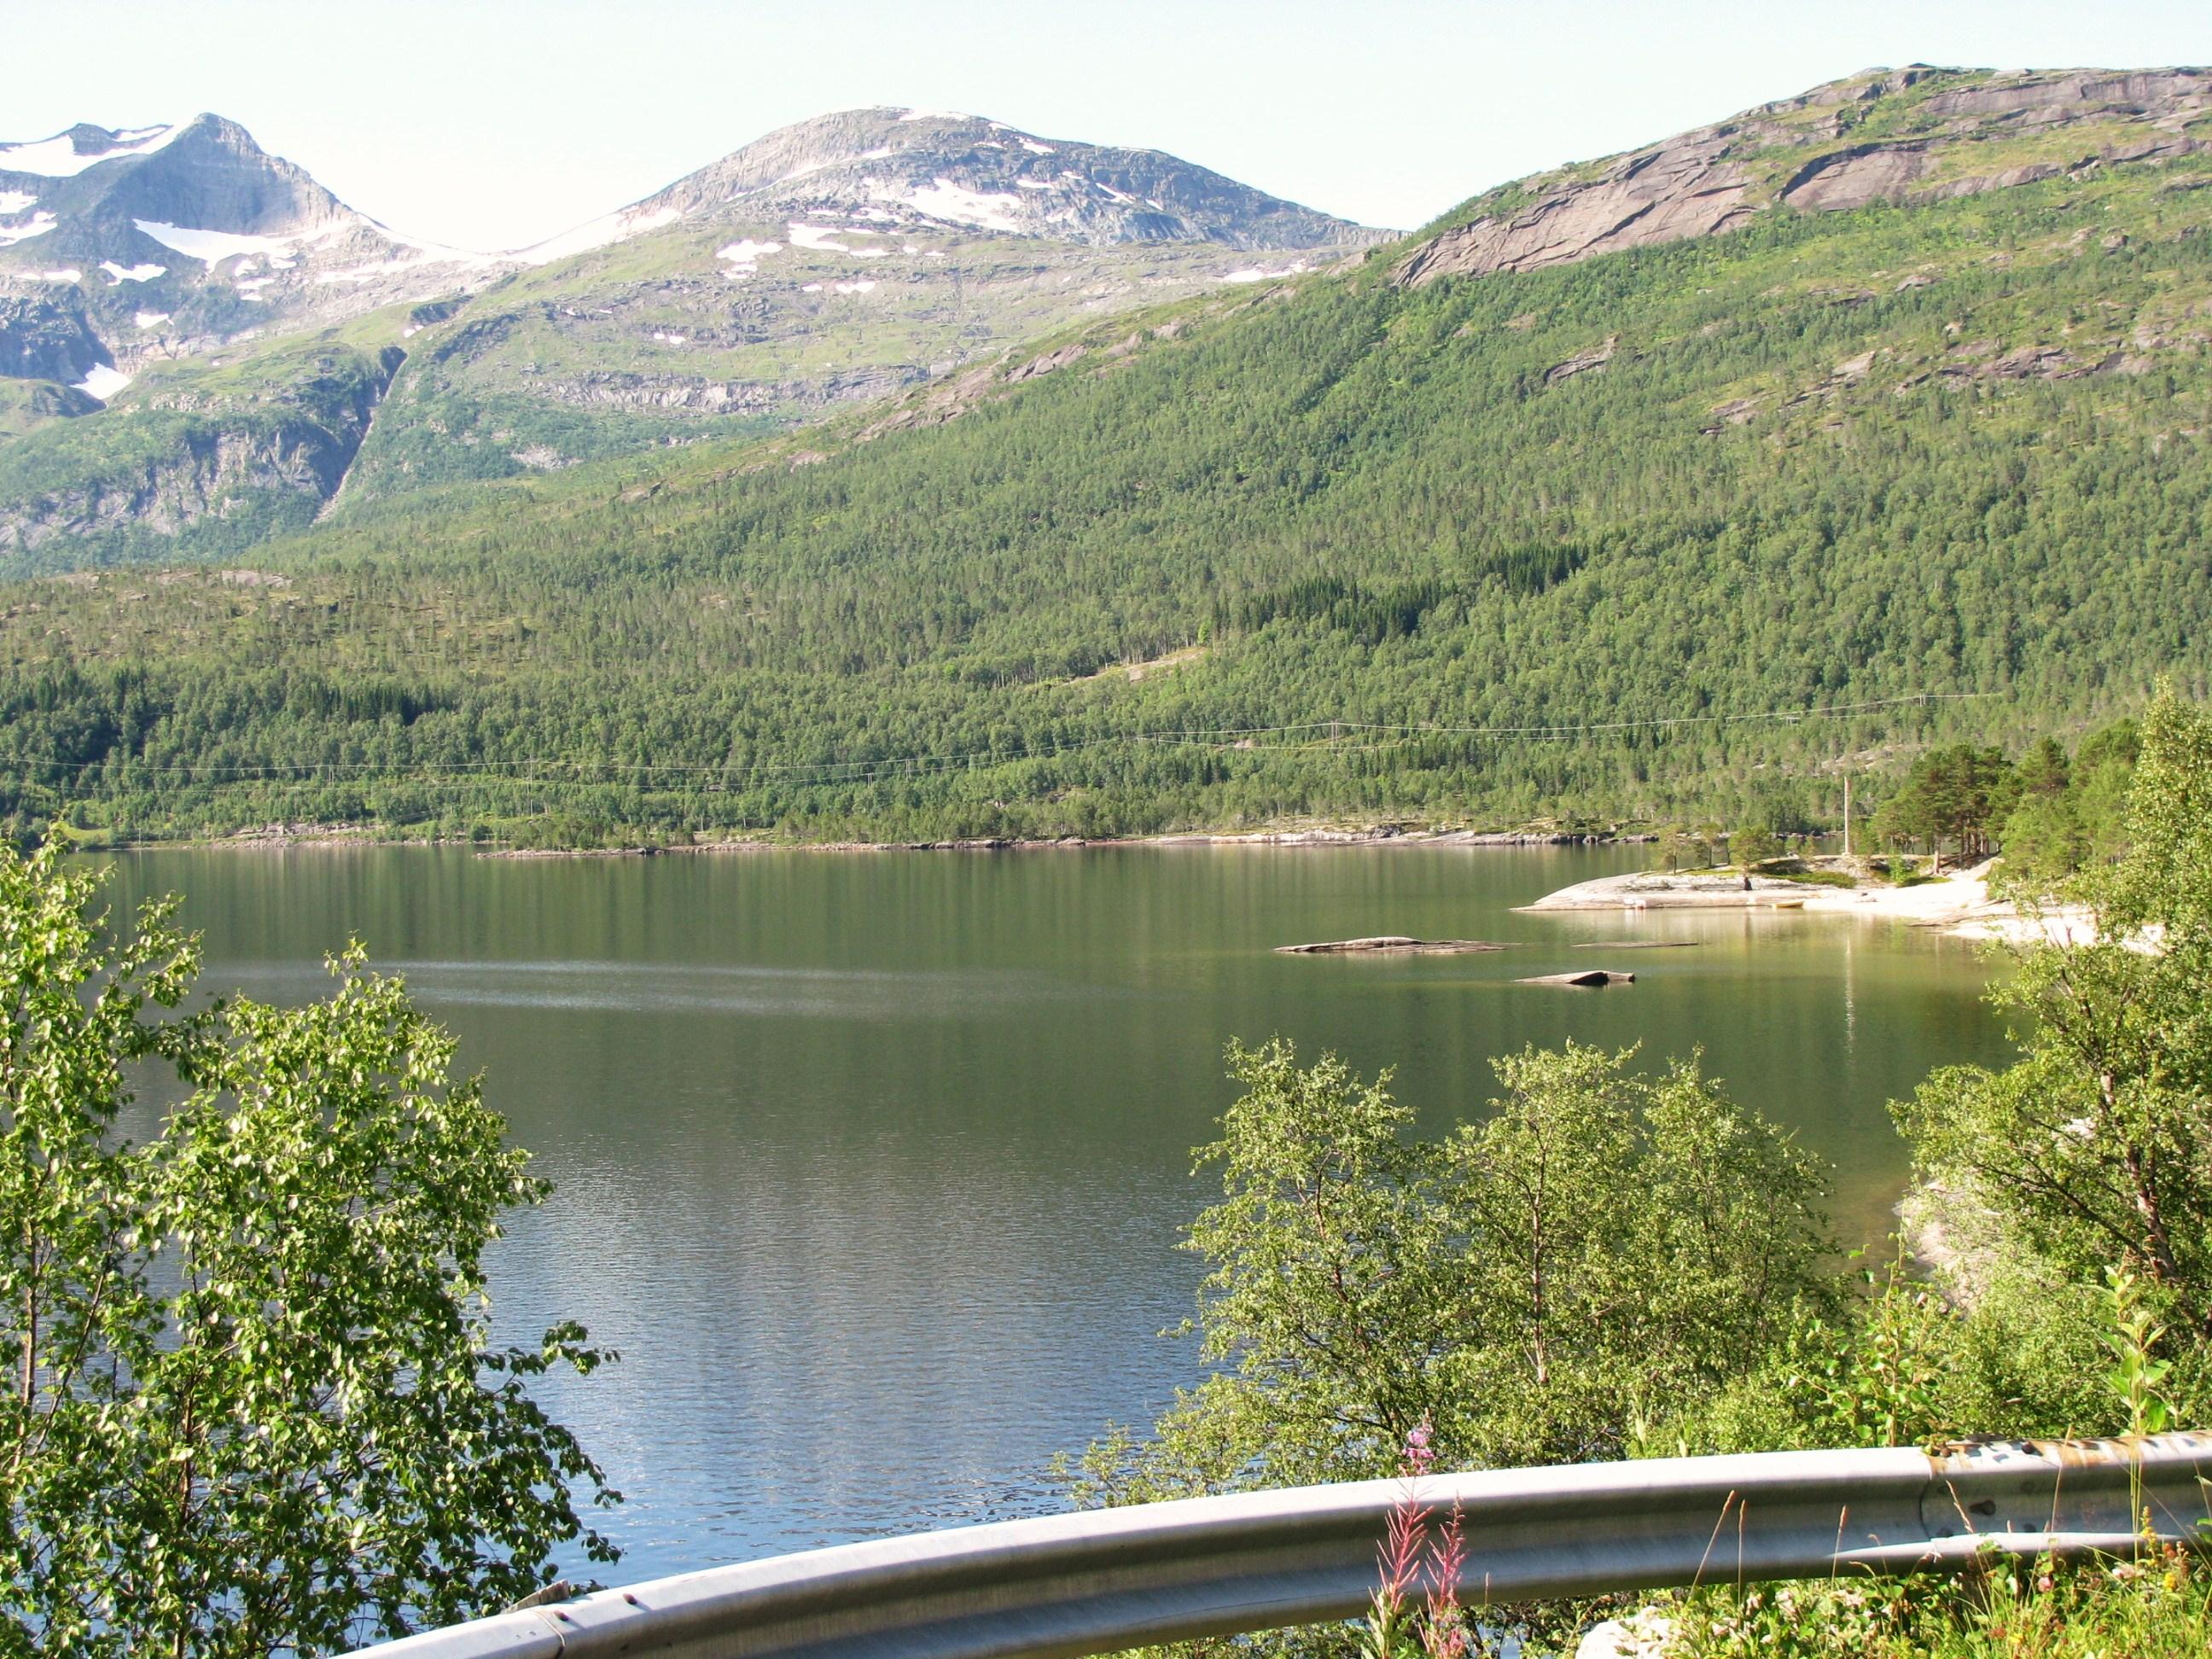 File:Hamarøy-mountains-lake-beach-adj.JPG